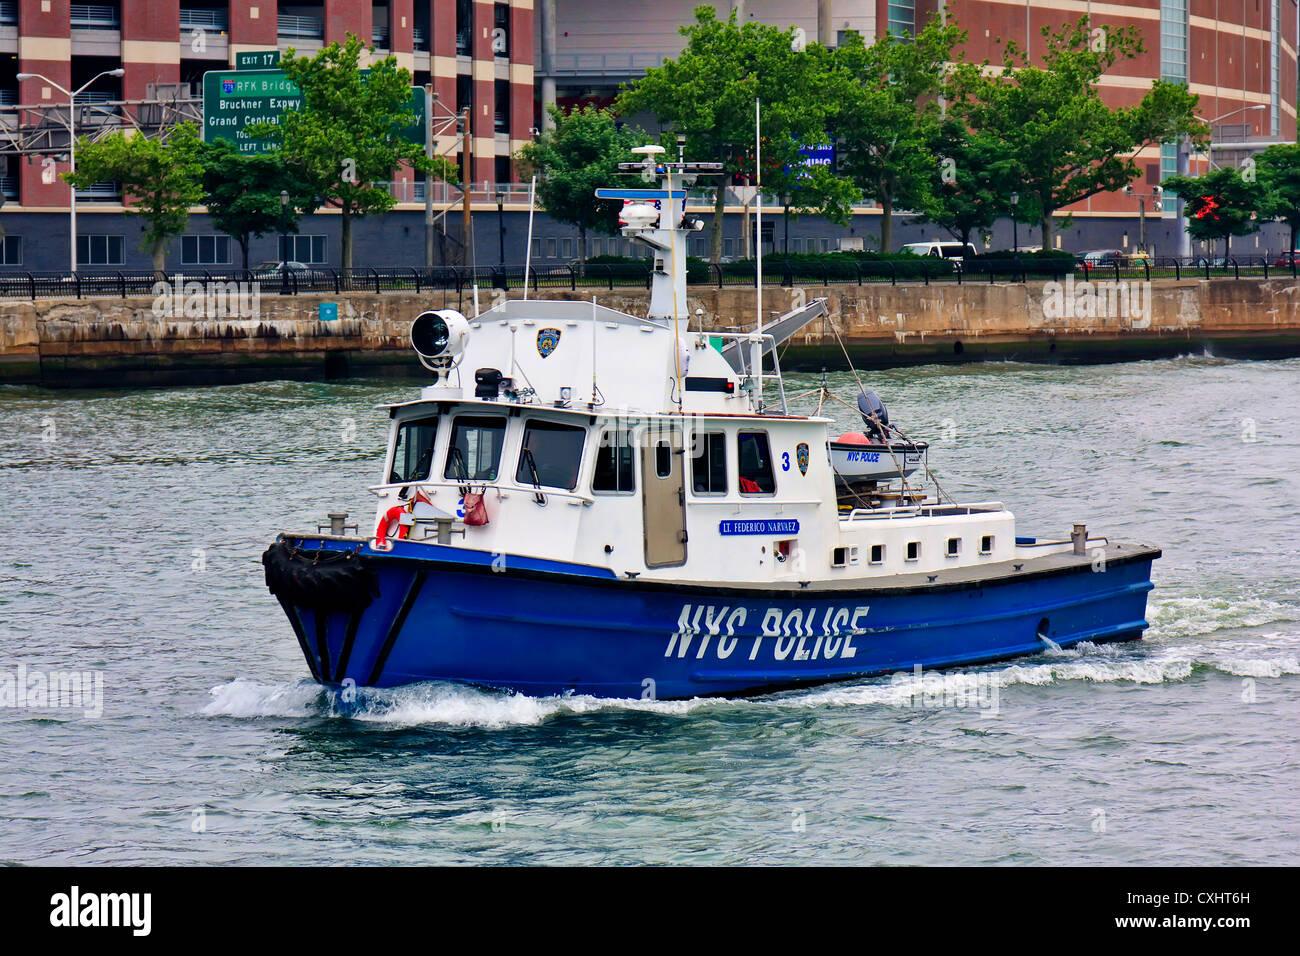 NYPD's Patrol Boat - Stock Image